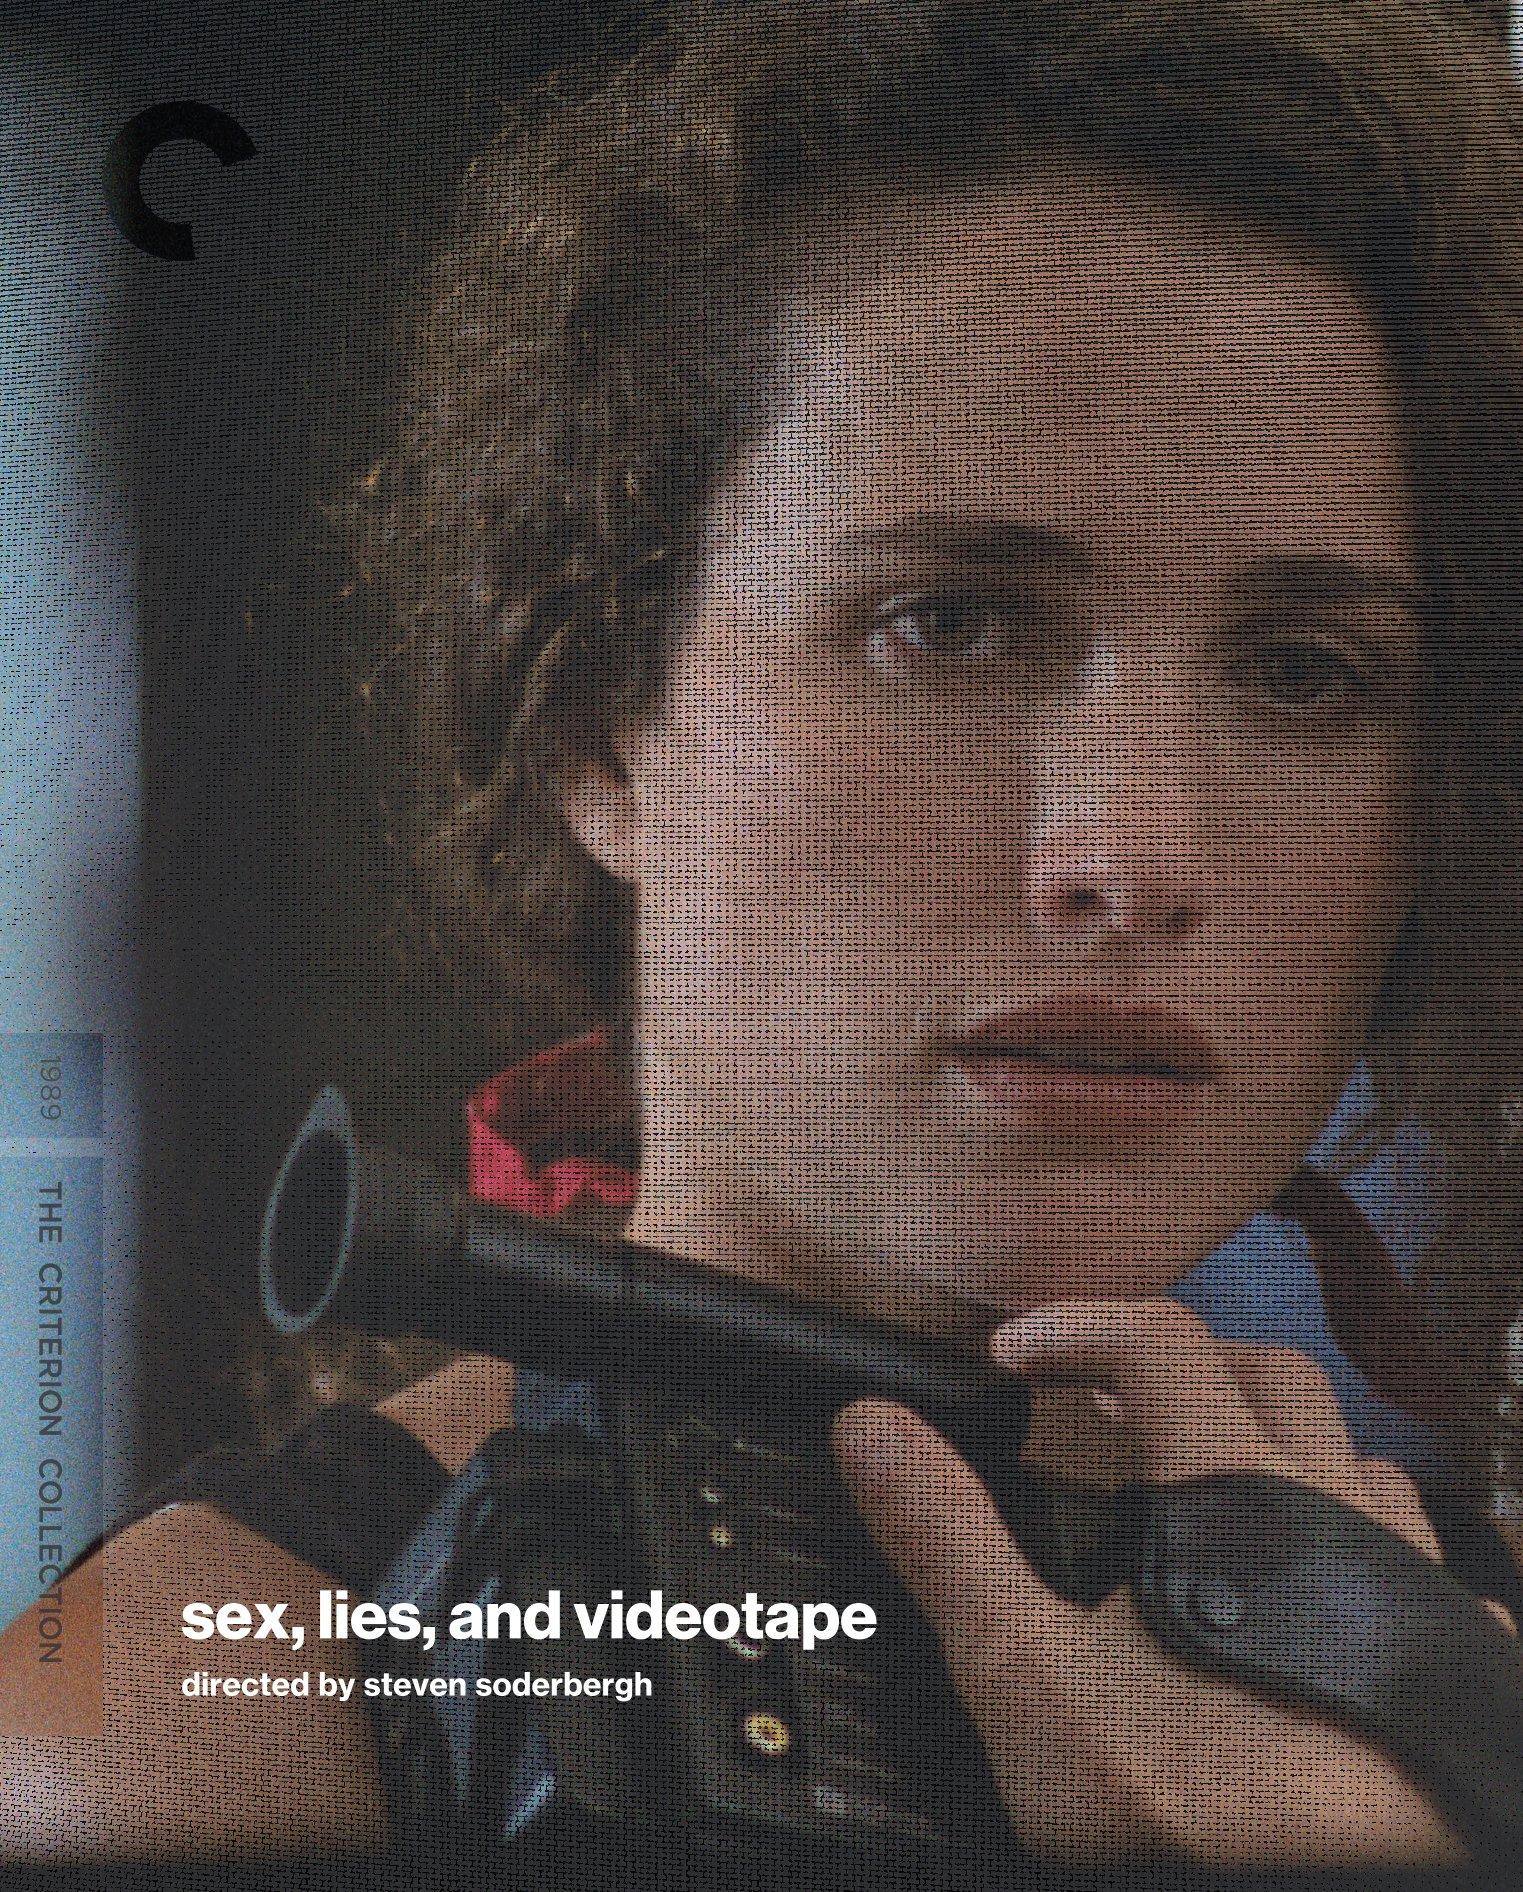 Секс, ложь и видео / Sex, Lies, and Videotape [4K Remastered]